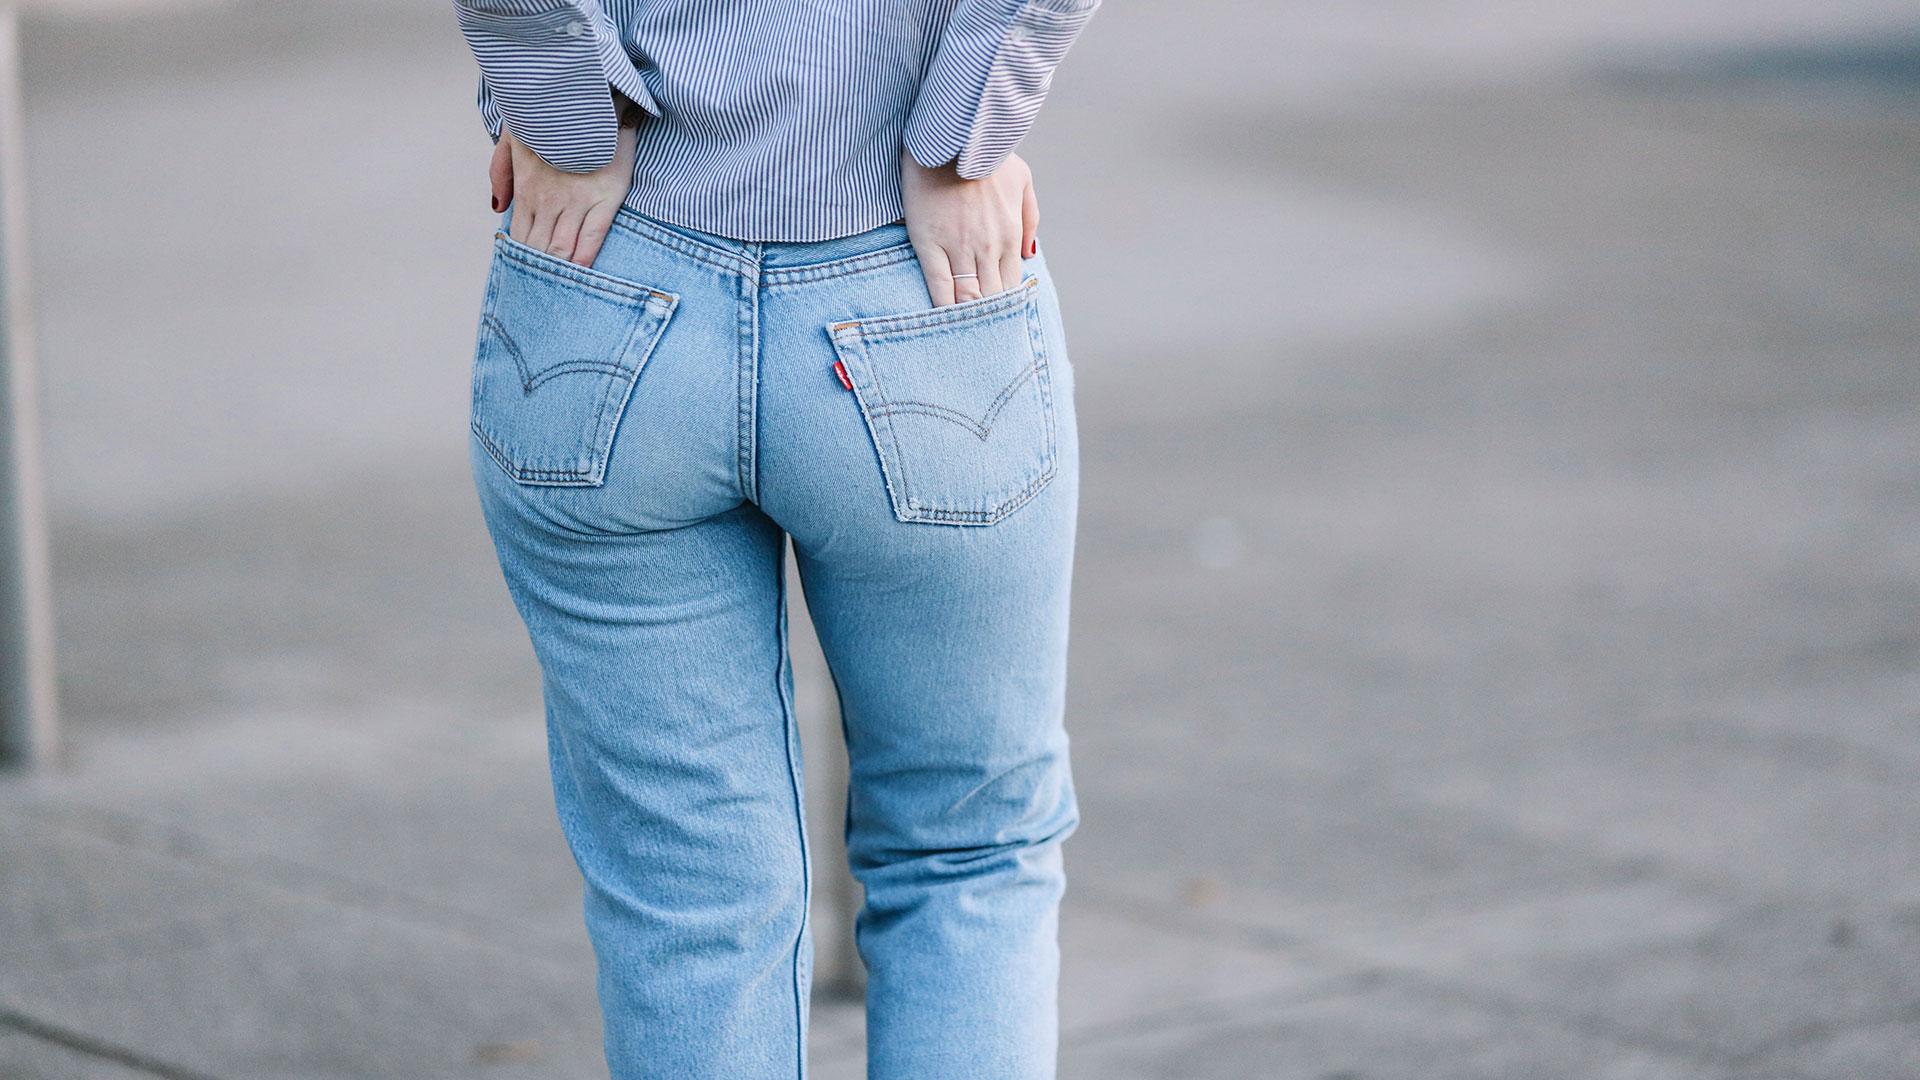 STYLECASTER | Denim Outfit Ideas | Boyfriend Jean Guide